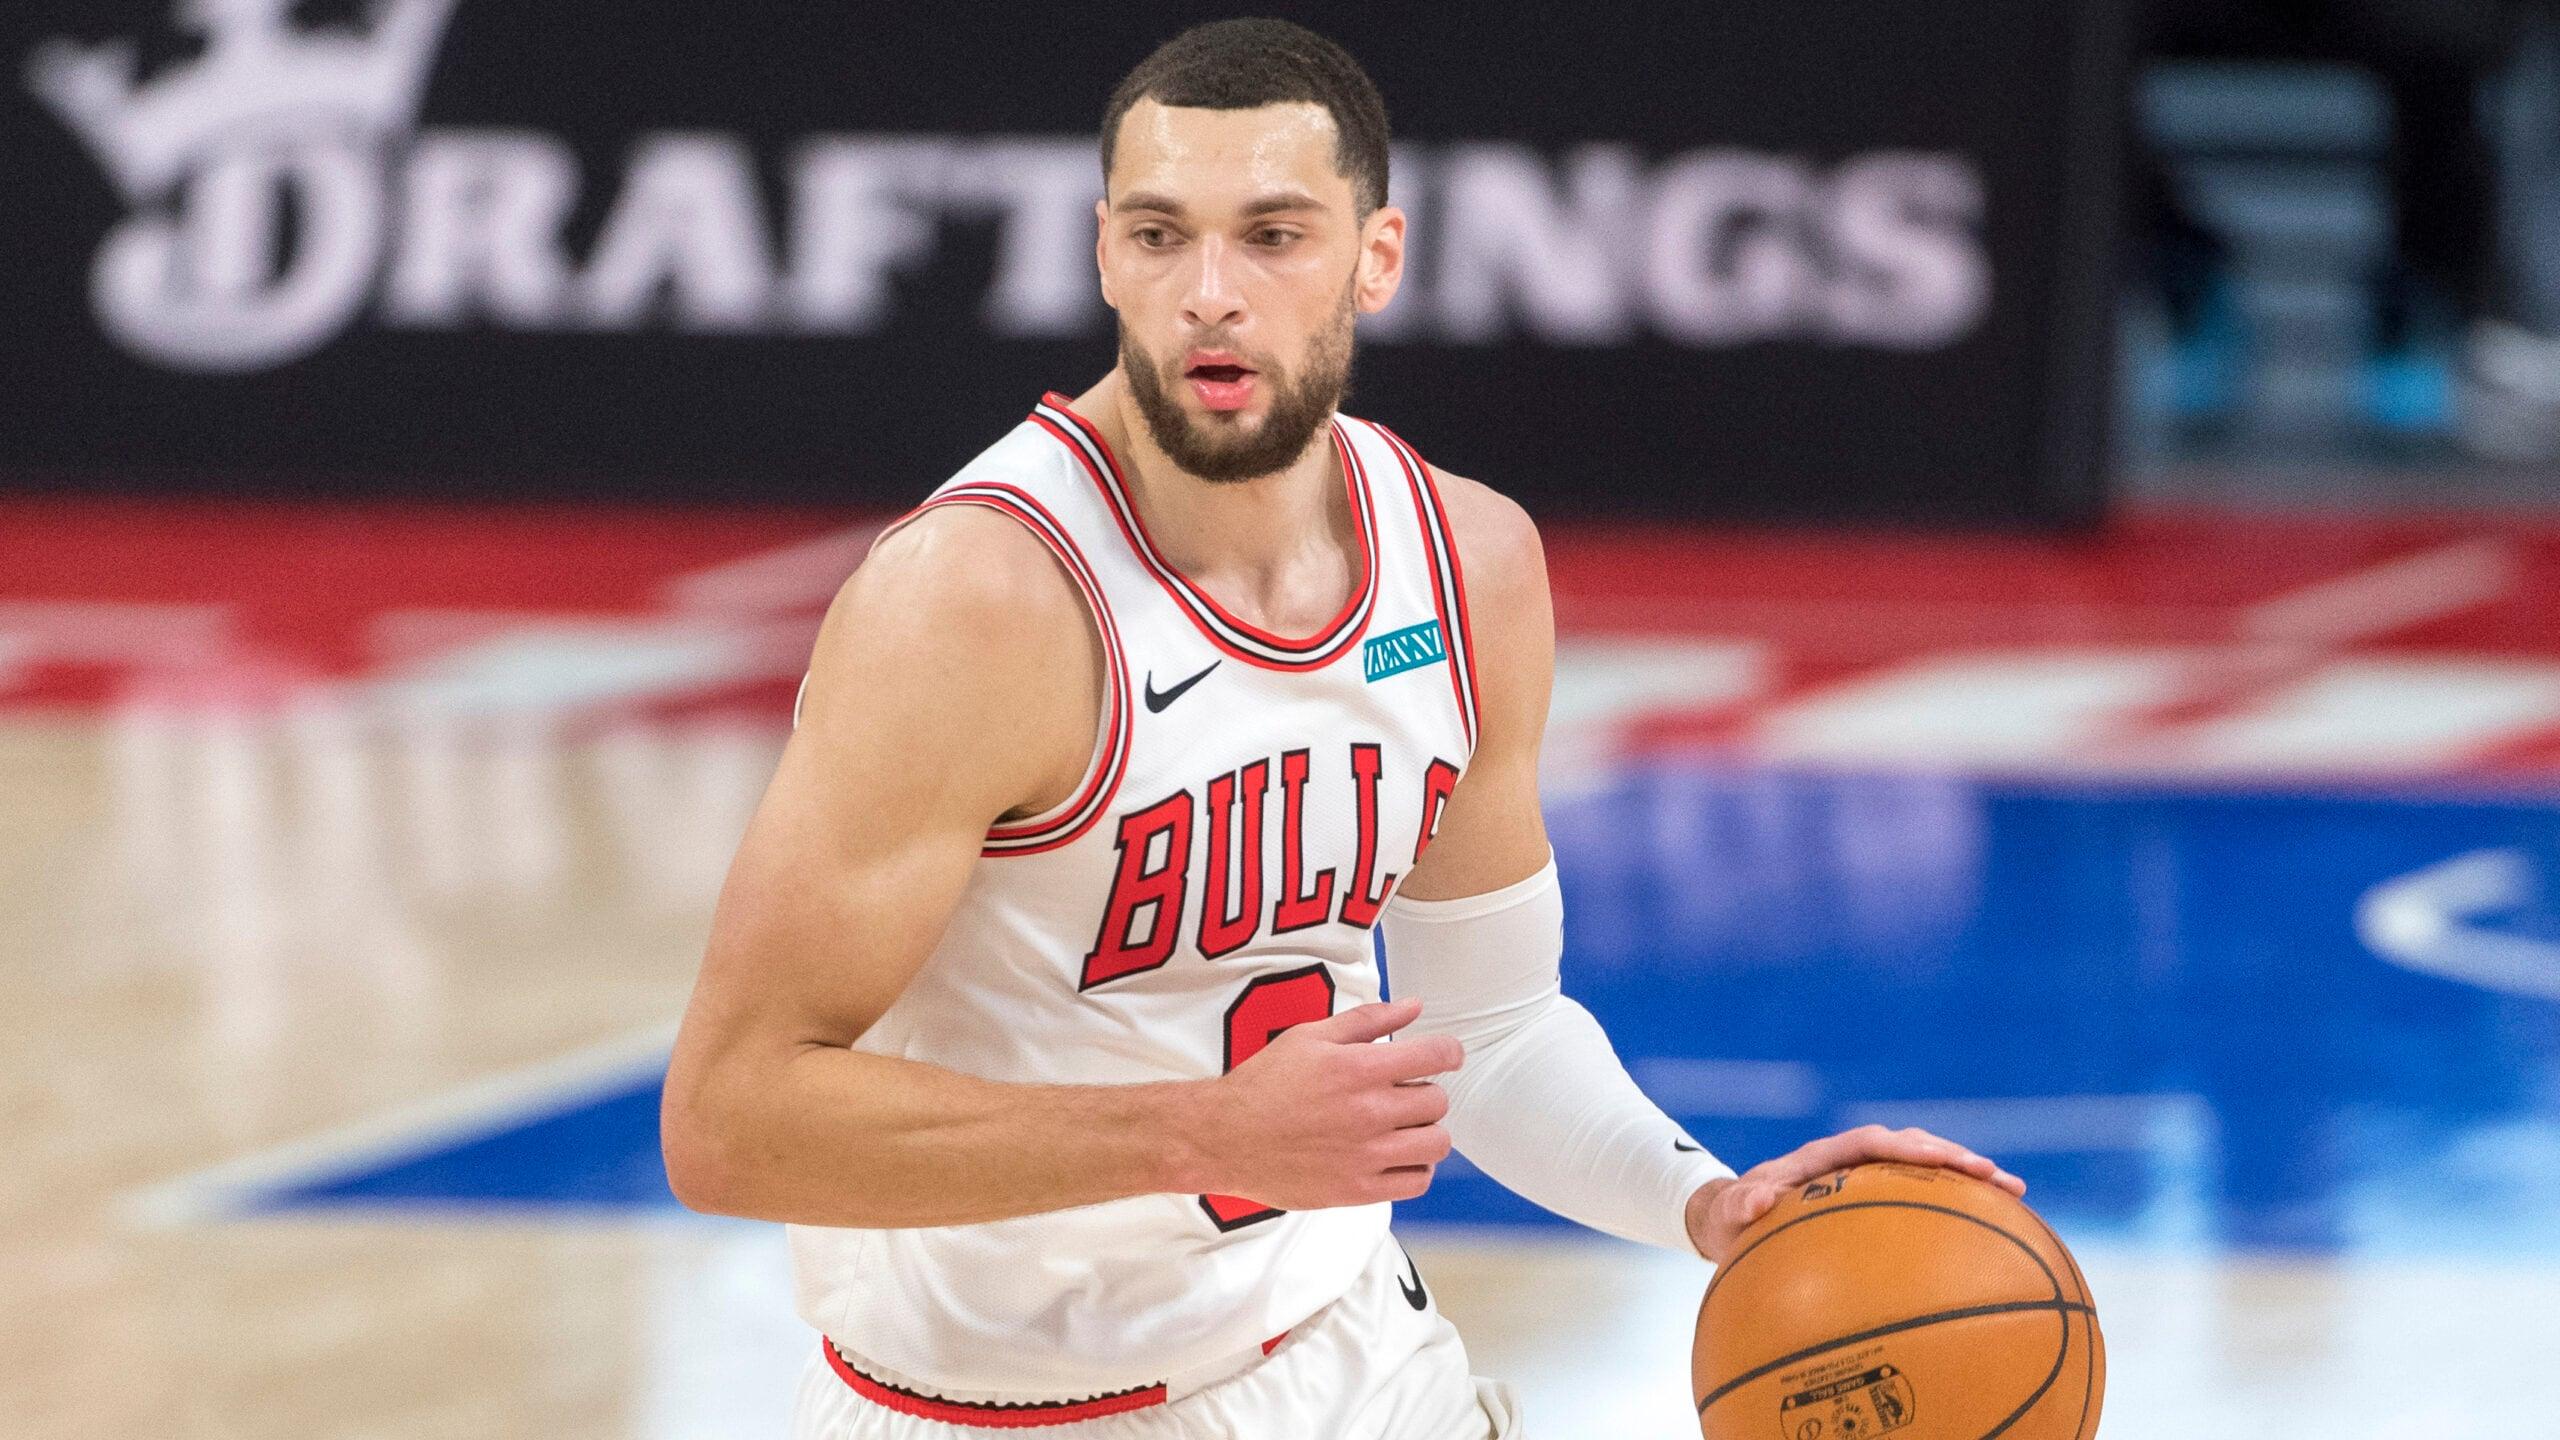 2021-22 NBA fantasy basketball shooting guard rankings and tiers